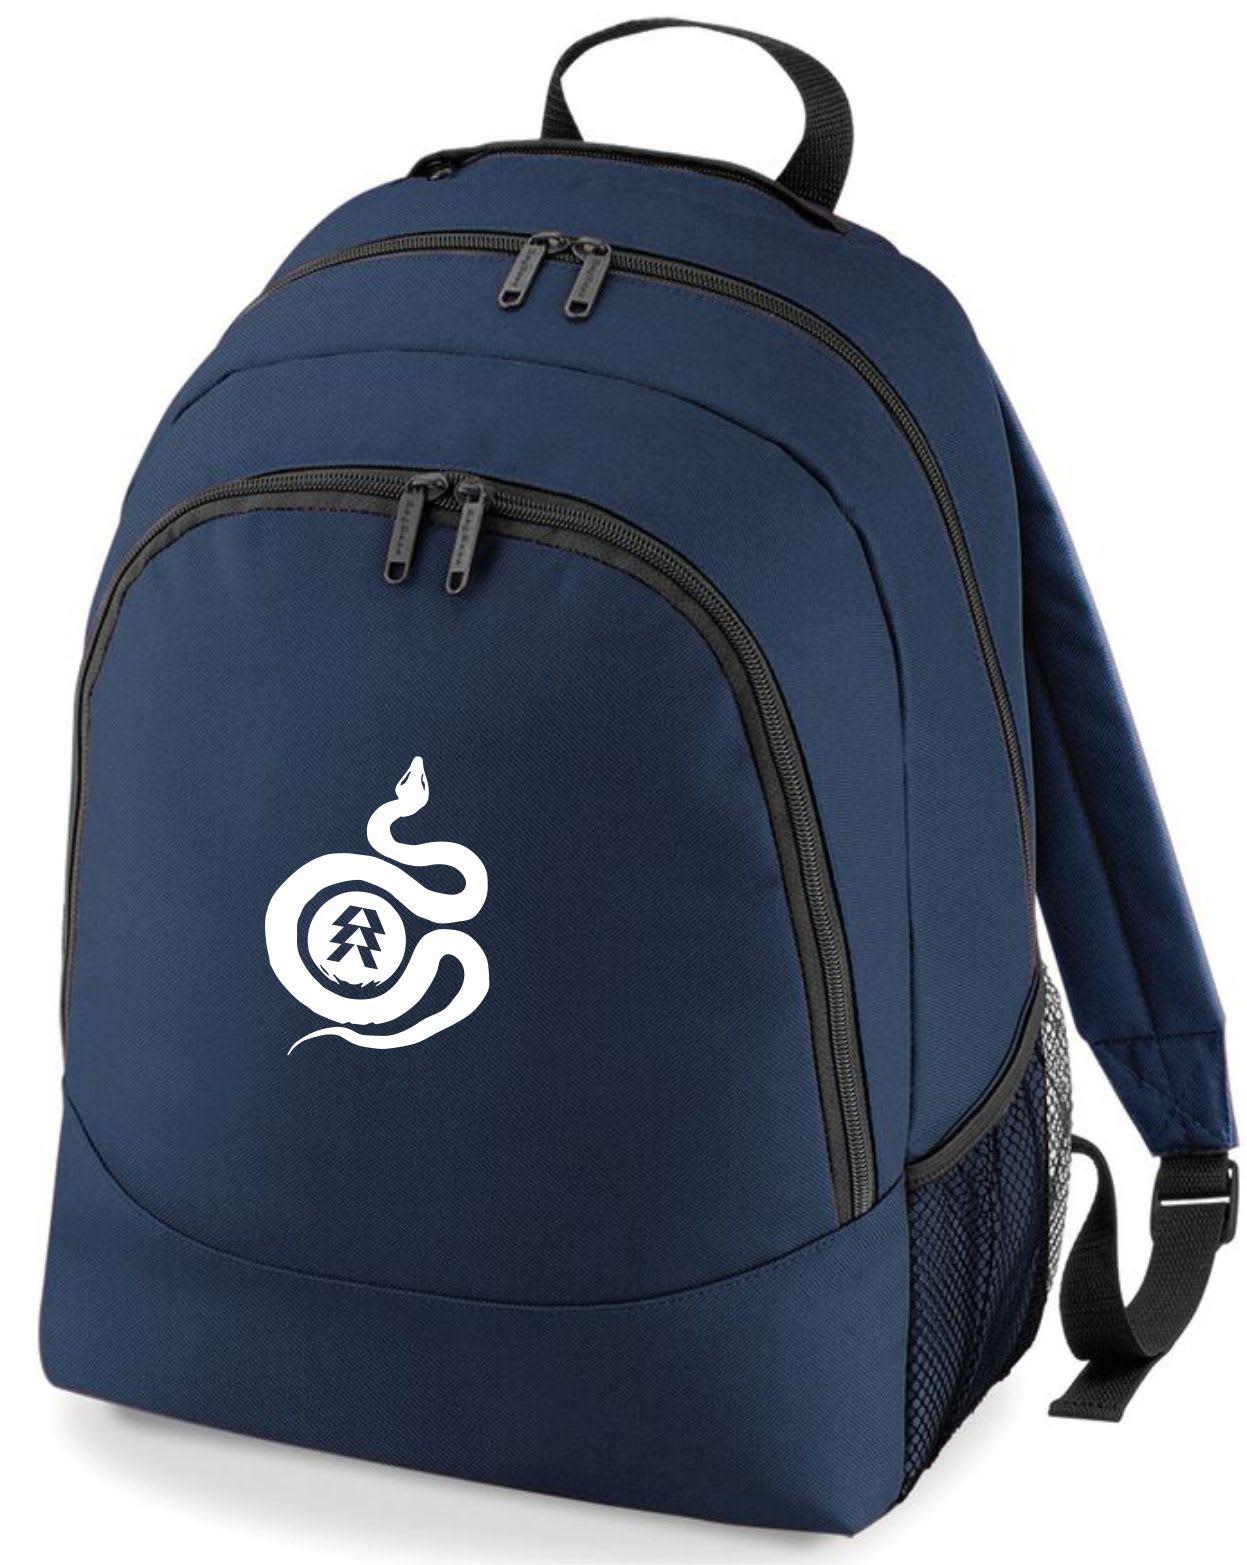 Destiny 2 Rucksack Bag Subclass Hunter